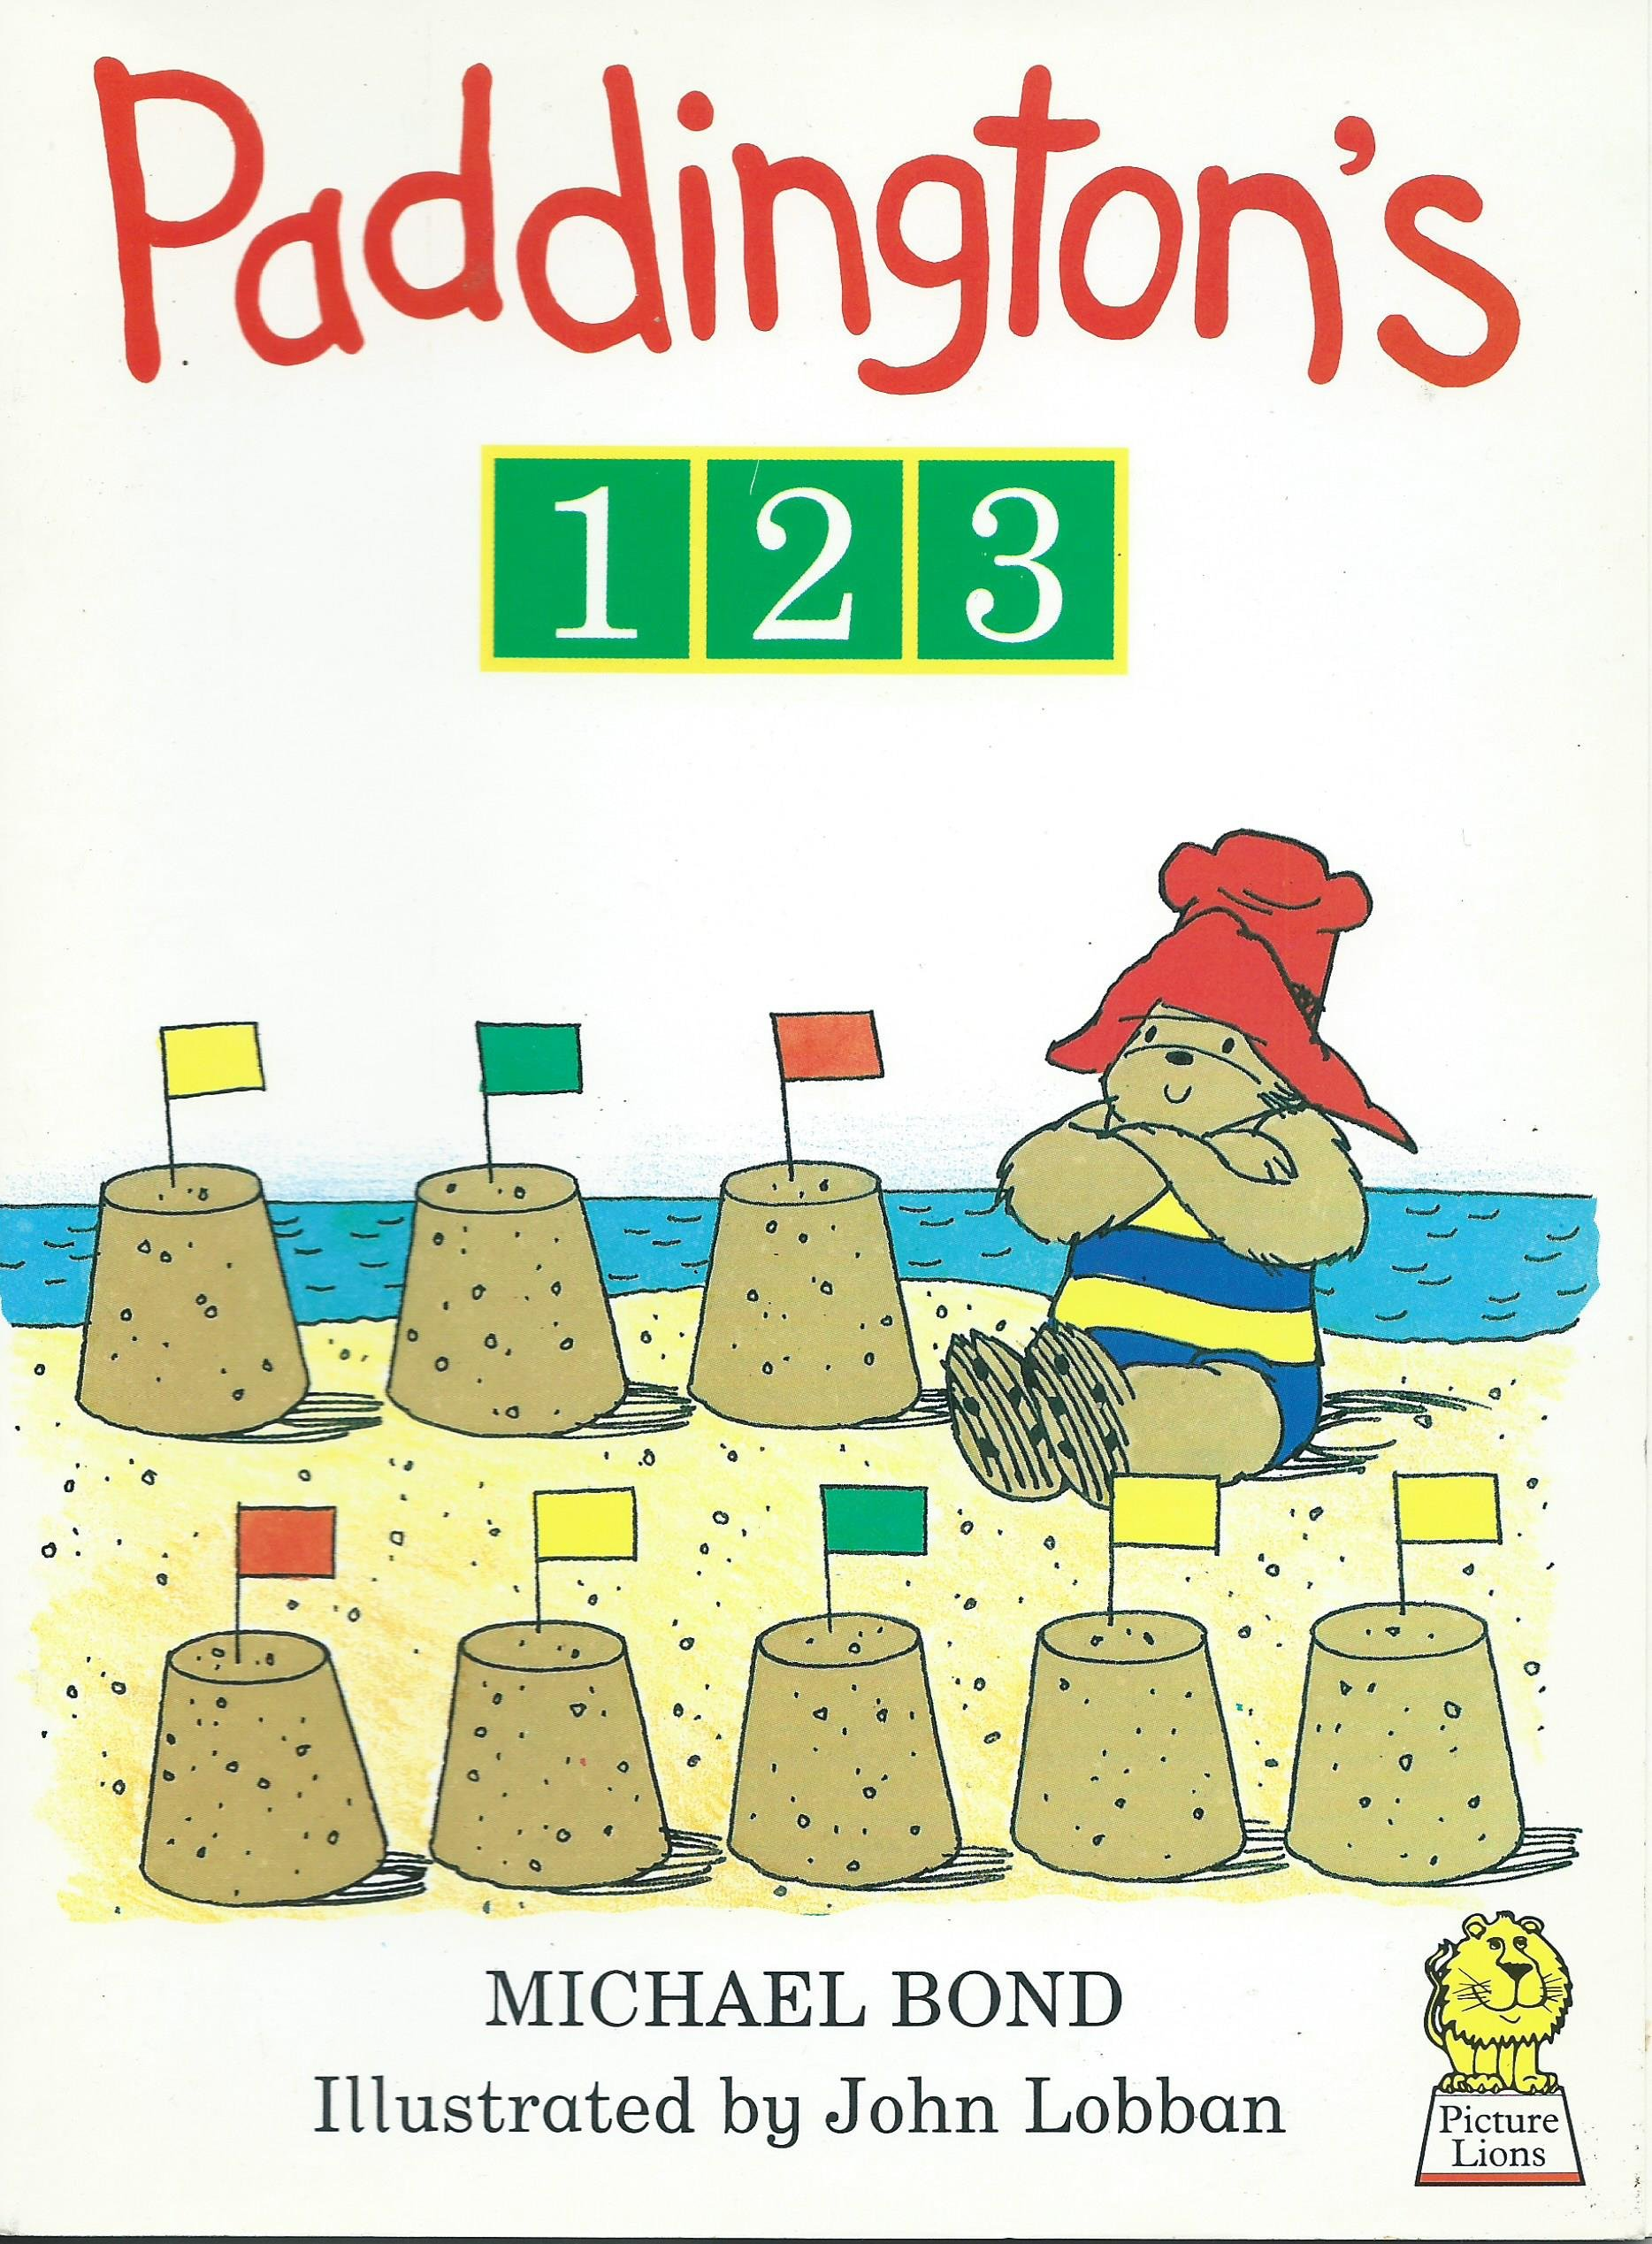 Paddington's 123